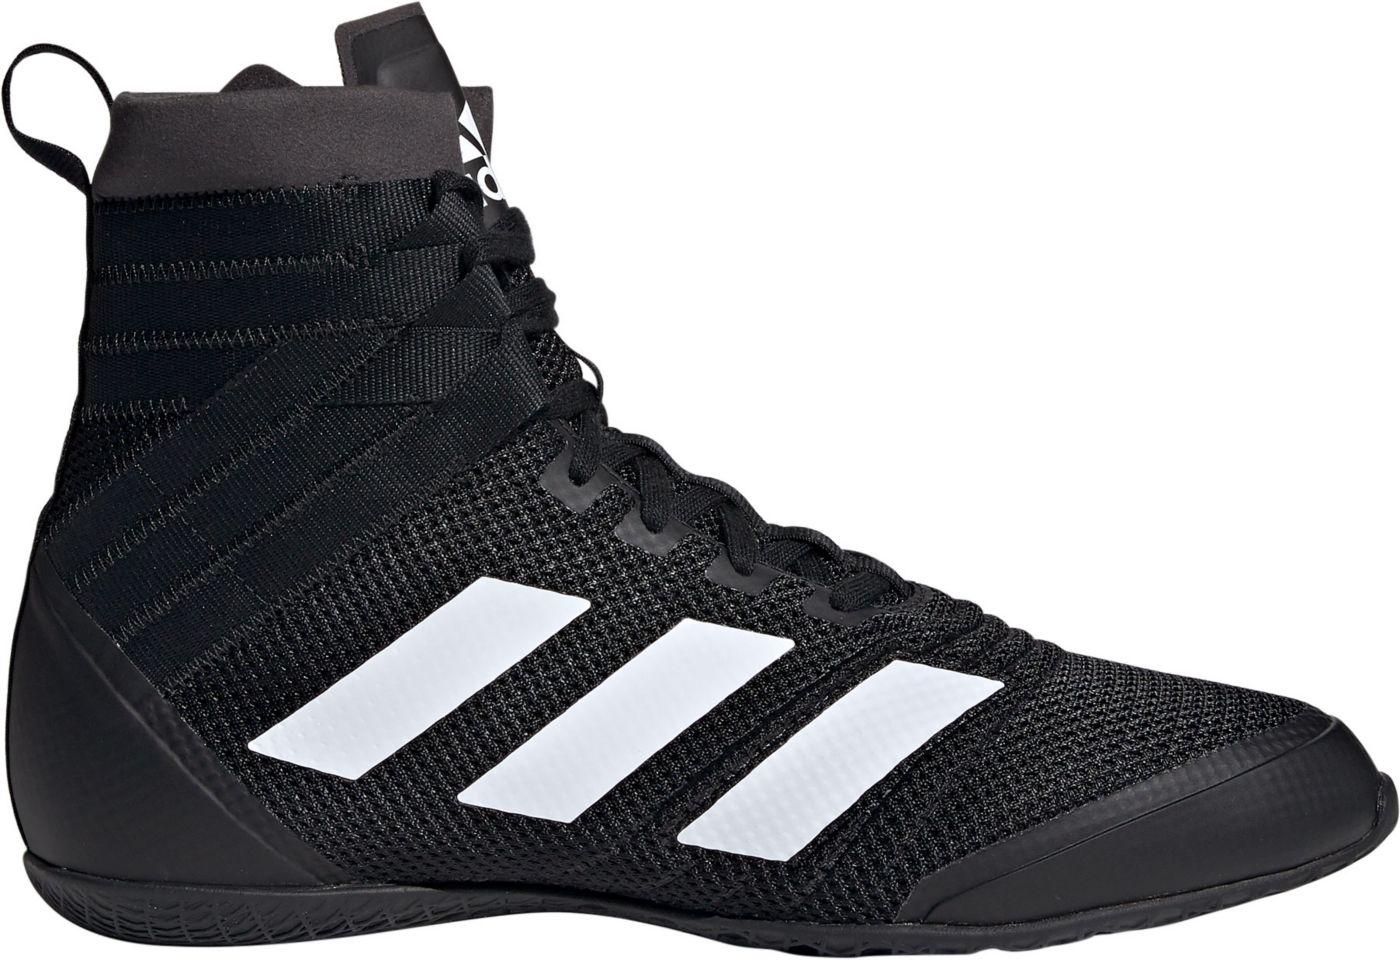 adidas SpeedX 18 Boxing Shoes